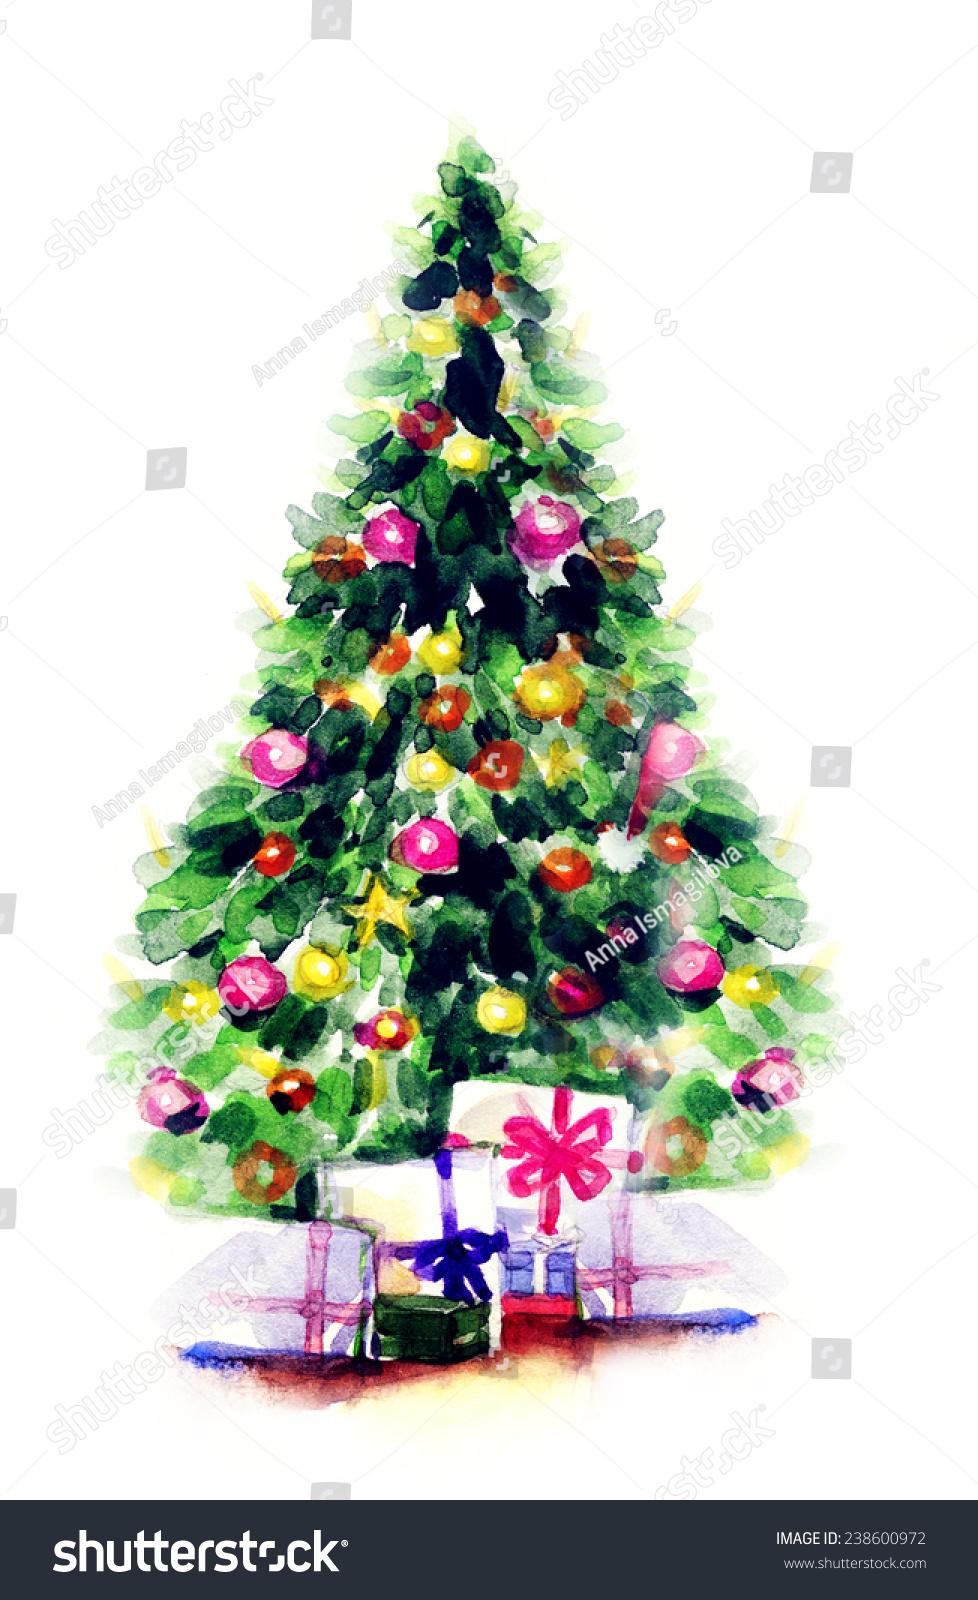 Decorated Christmas Tree Watercolor Illustration Stock Illustration ...